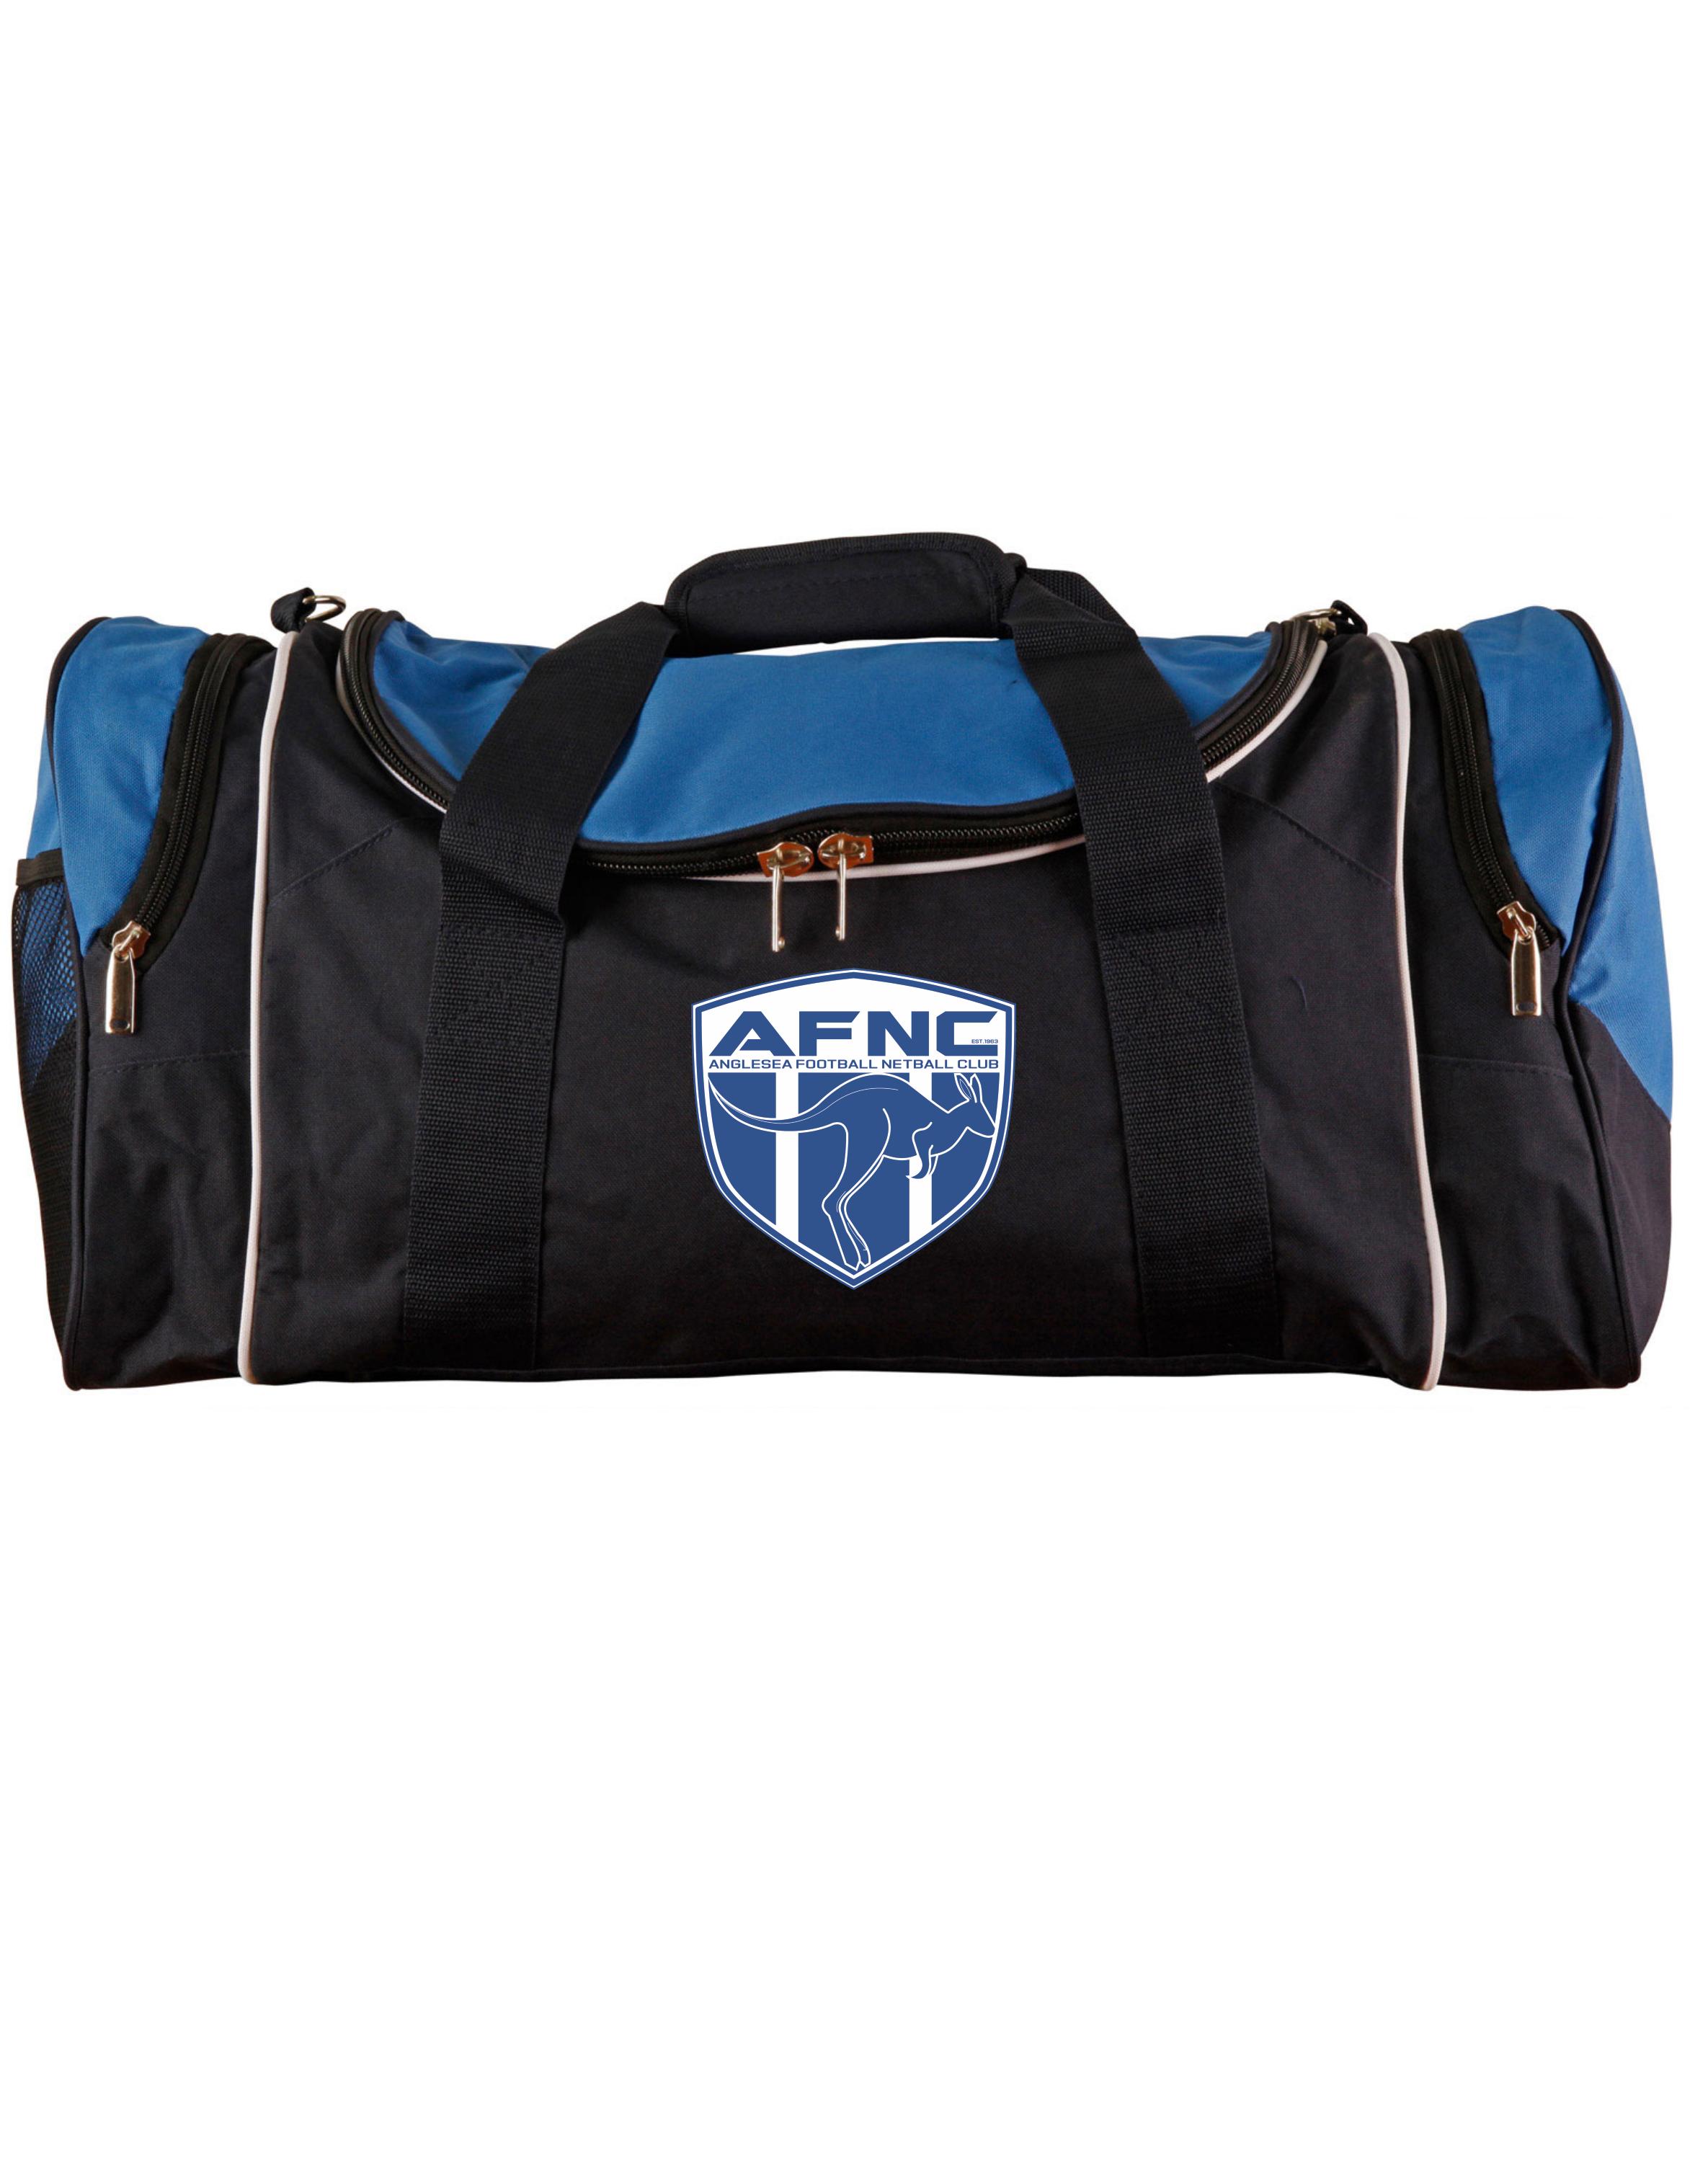 Sports Bag Navy/White/Royal